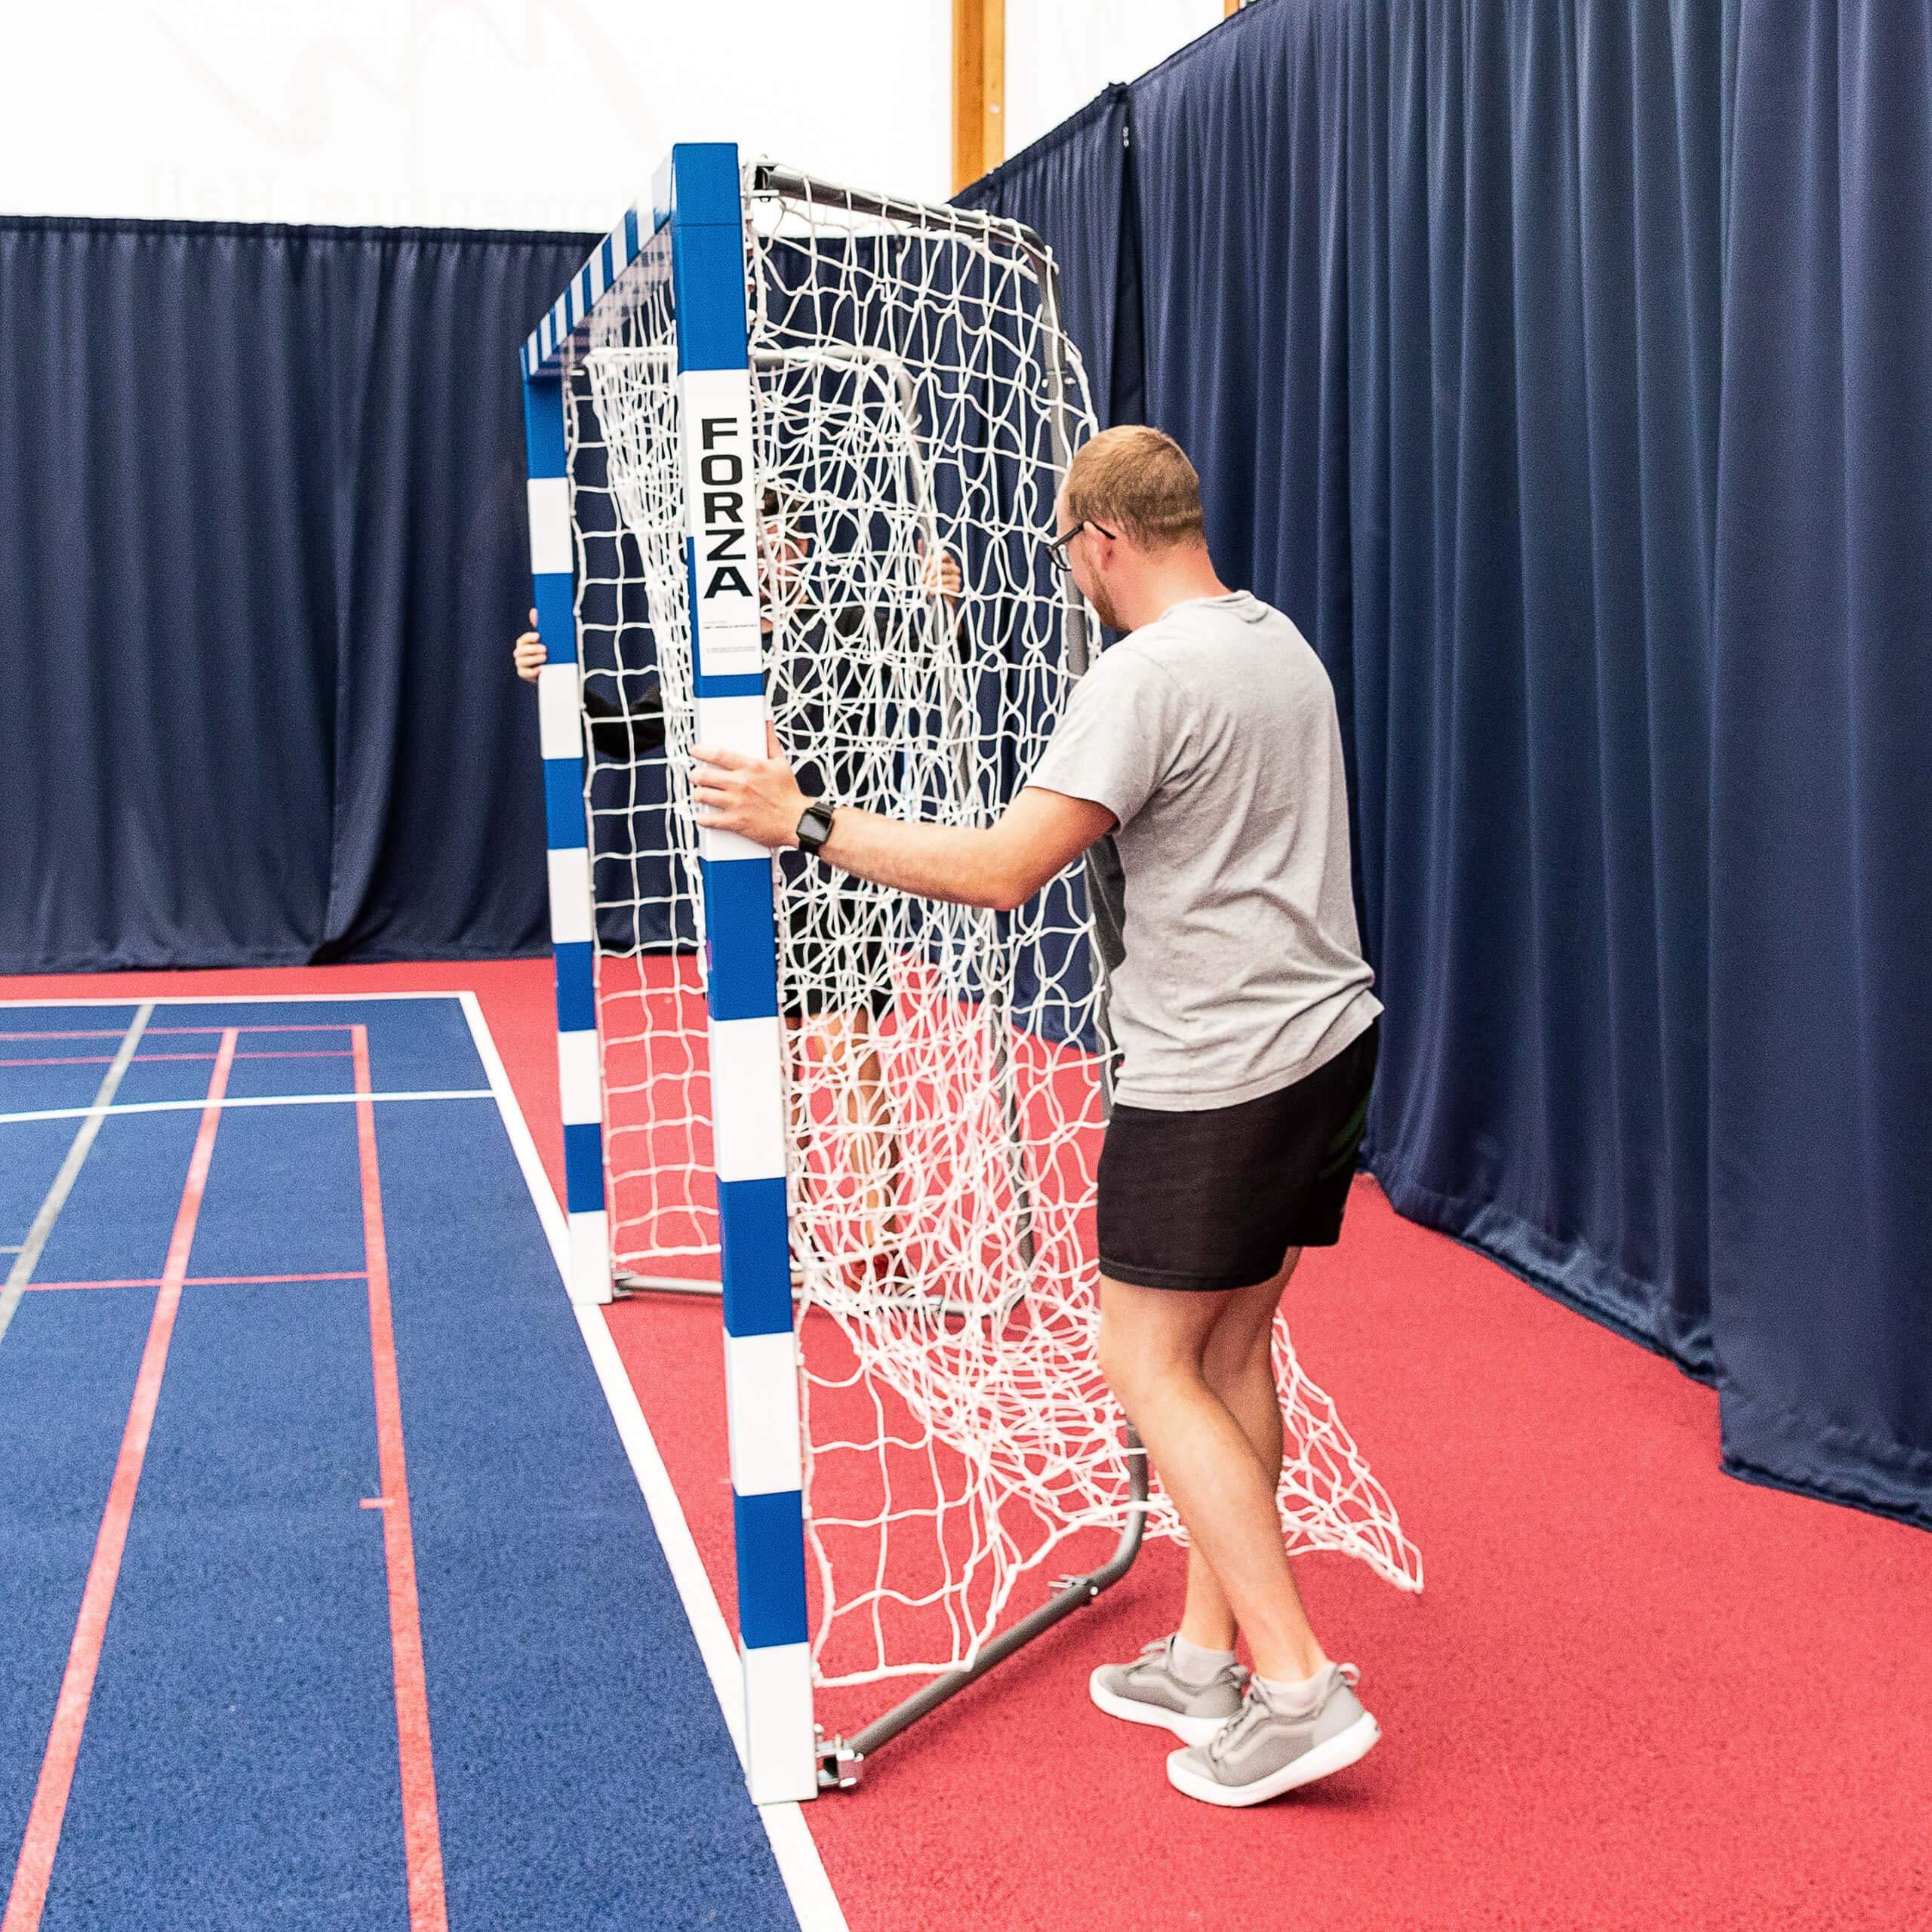 Forza Alu80 Competition Handball Goals   IHF Regulation Size 3m x 2m Handball Goal [Net World Sports] (Pair, Blue) by Forza (Image #5)